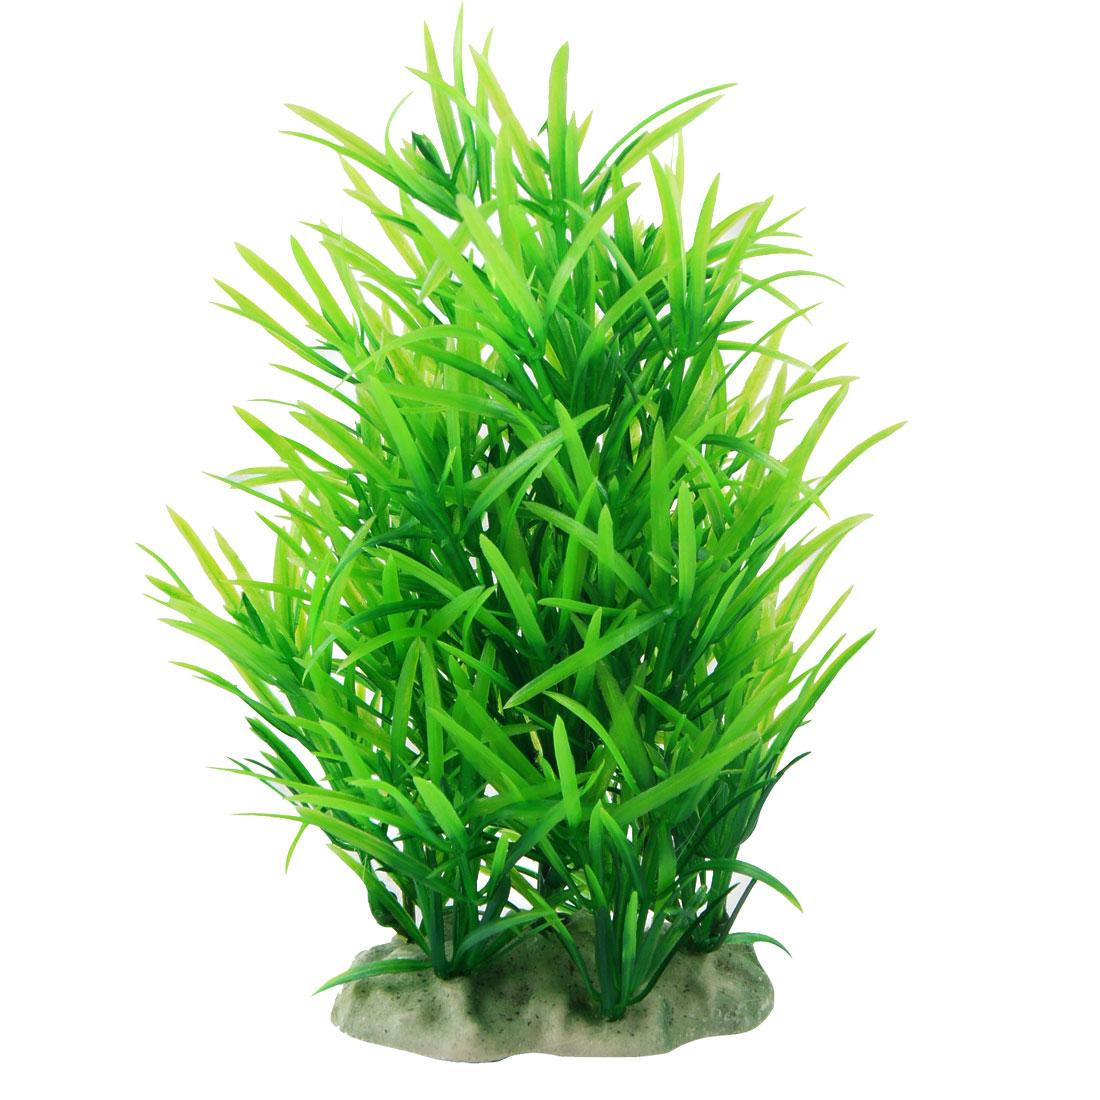 "Aquarium Decorative Green Plastic Plant Grass 7.1"" Height"